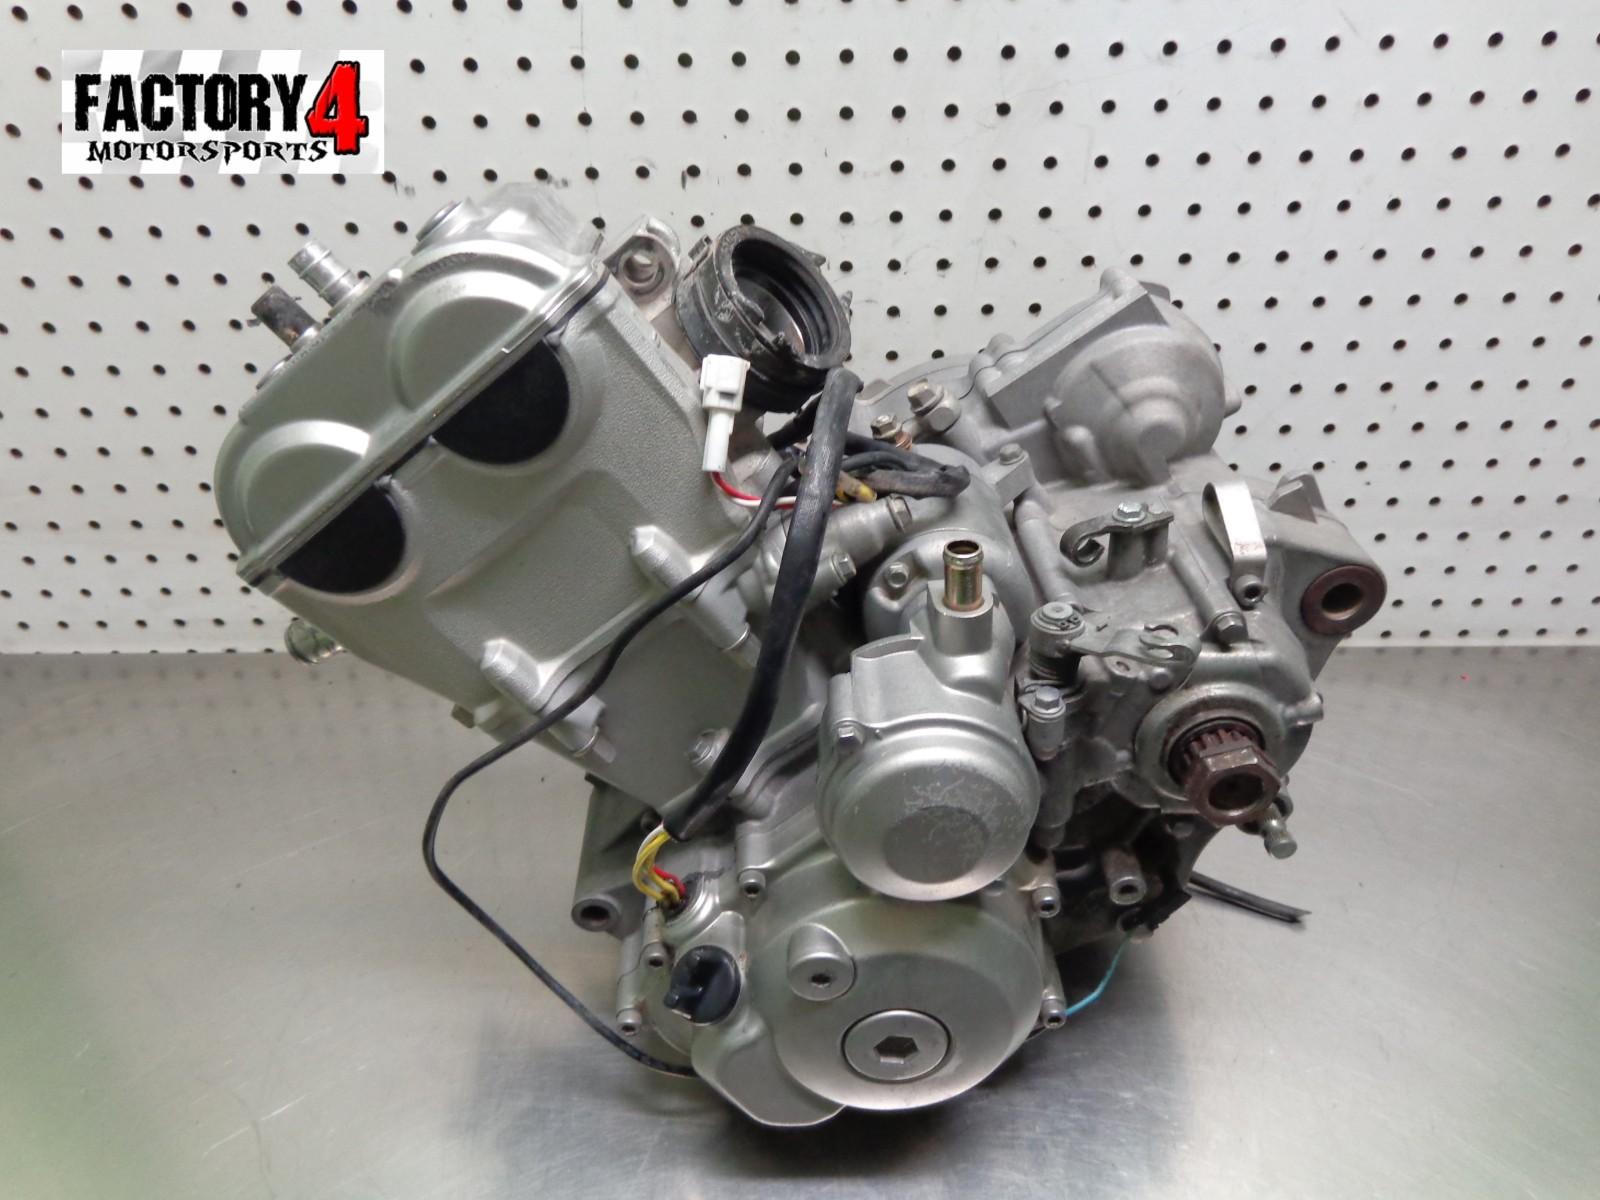 2006 yamaha yfz450r yfz 450 complete motor engine nice for 412 motors friendship tn